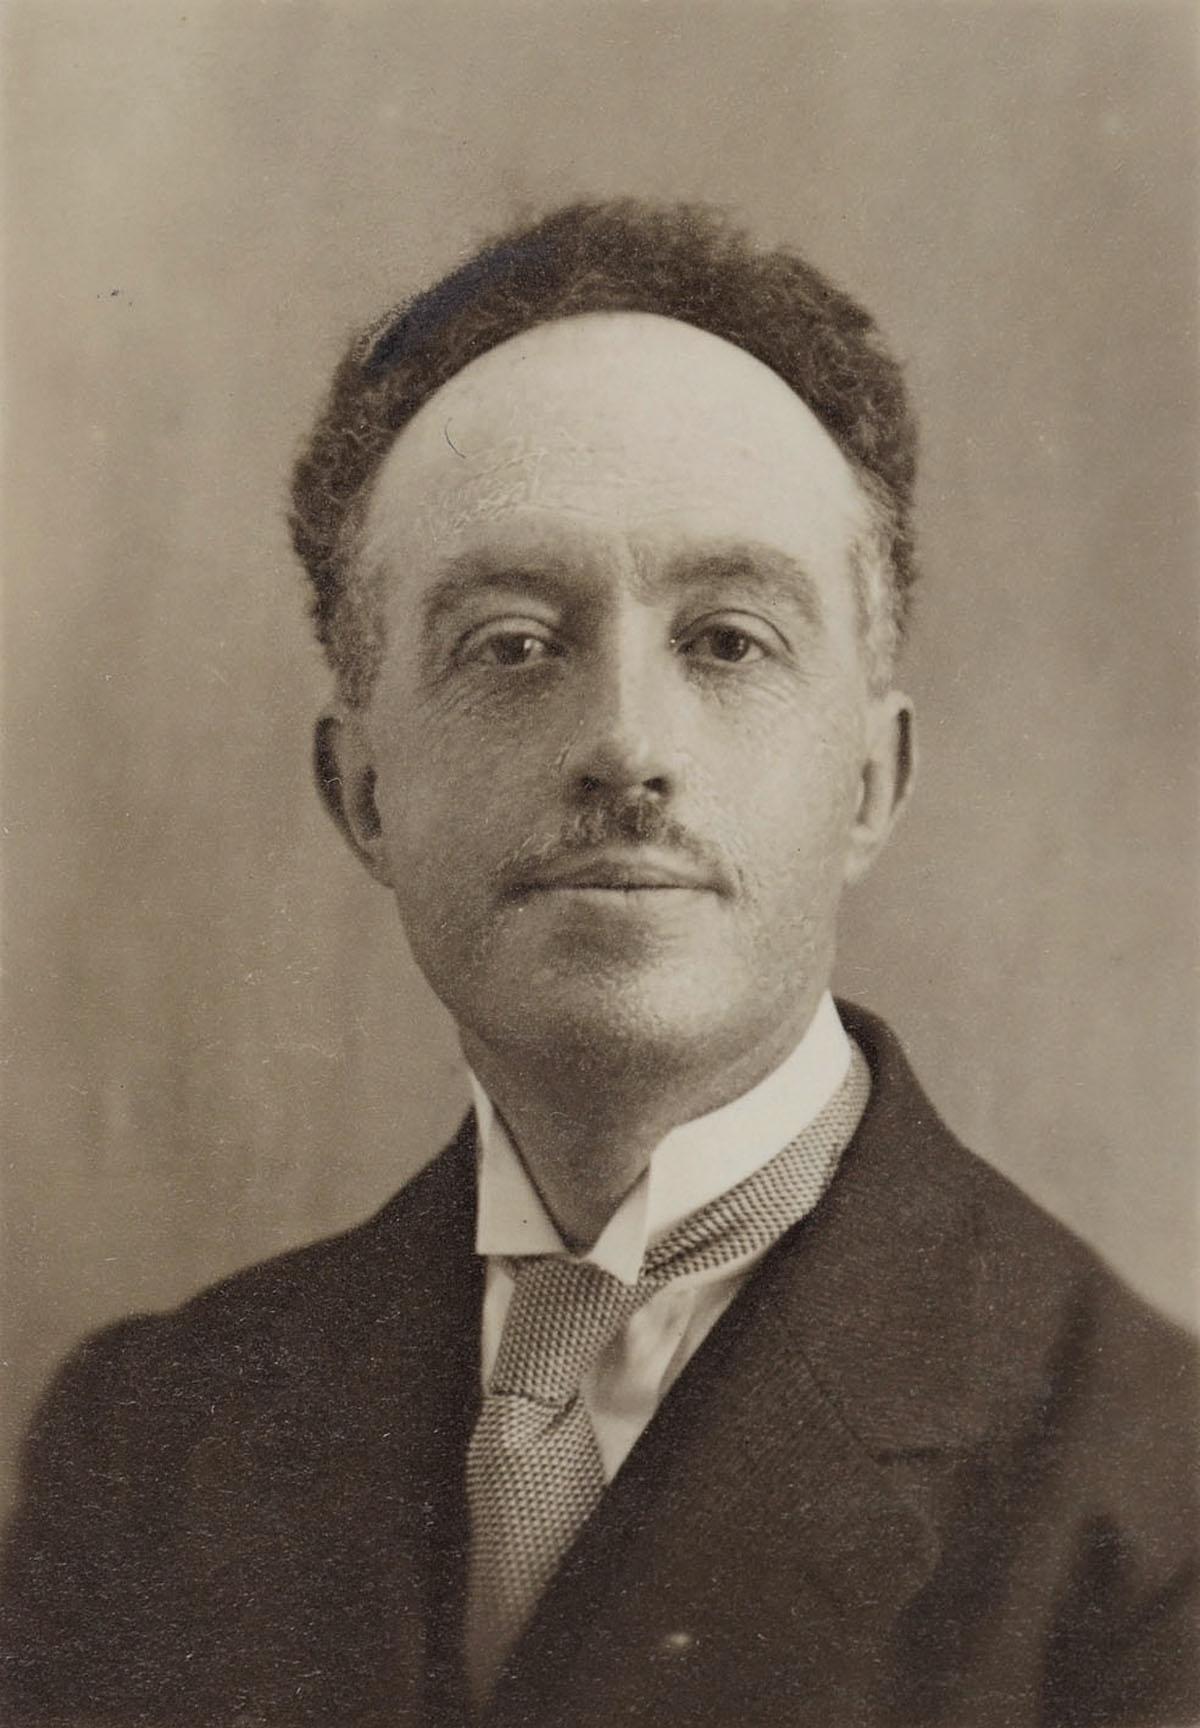 De broglie phd thesis